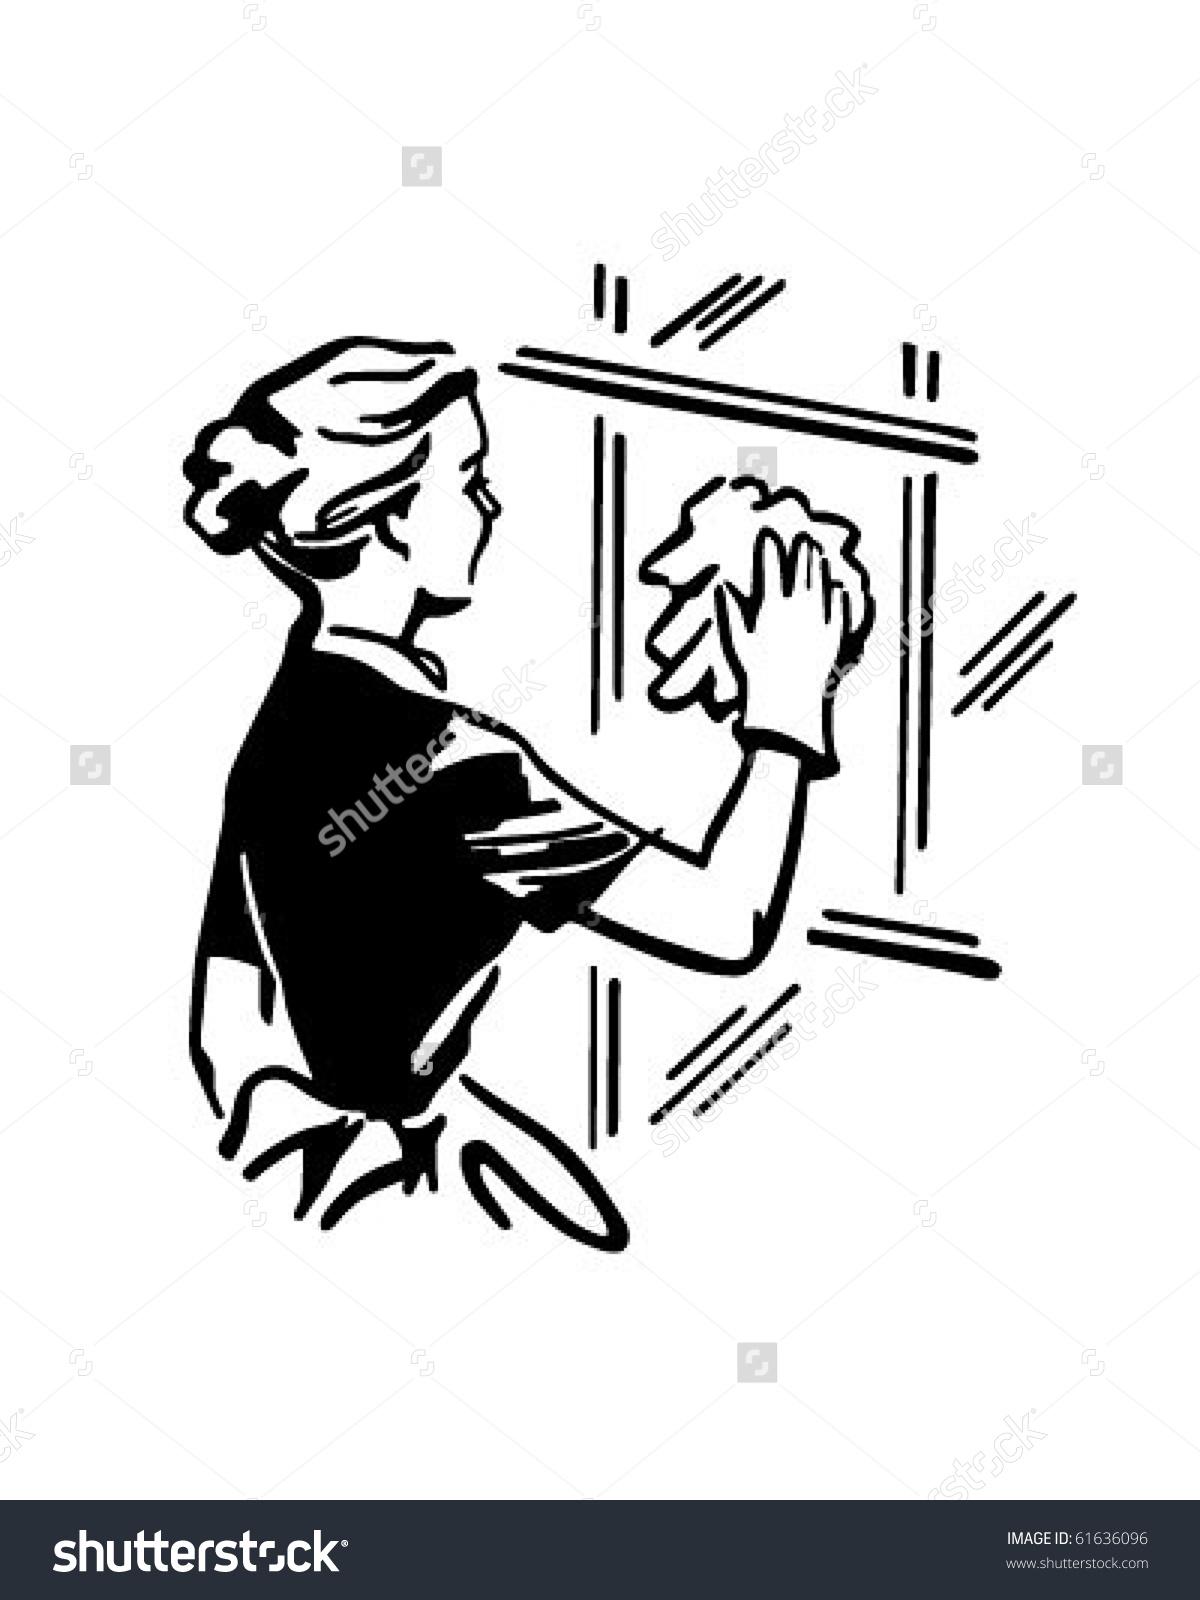 Woman Cleaning Window Retro Clip Art Stock Vector 61636096.